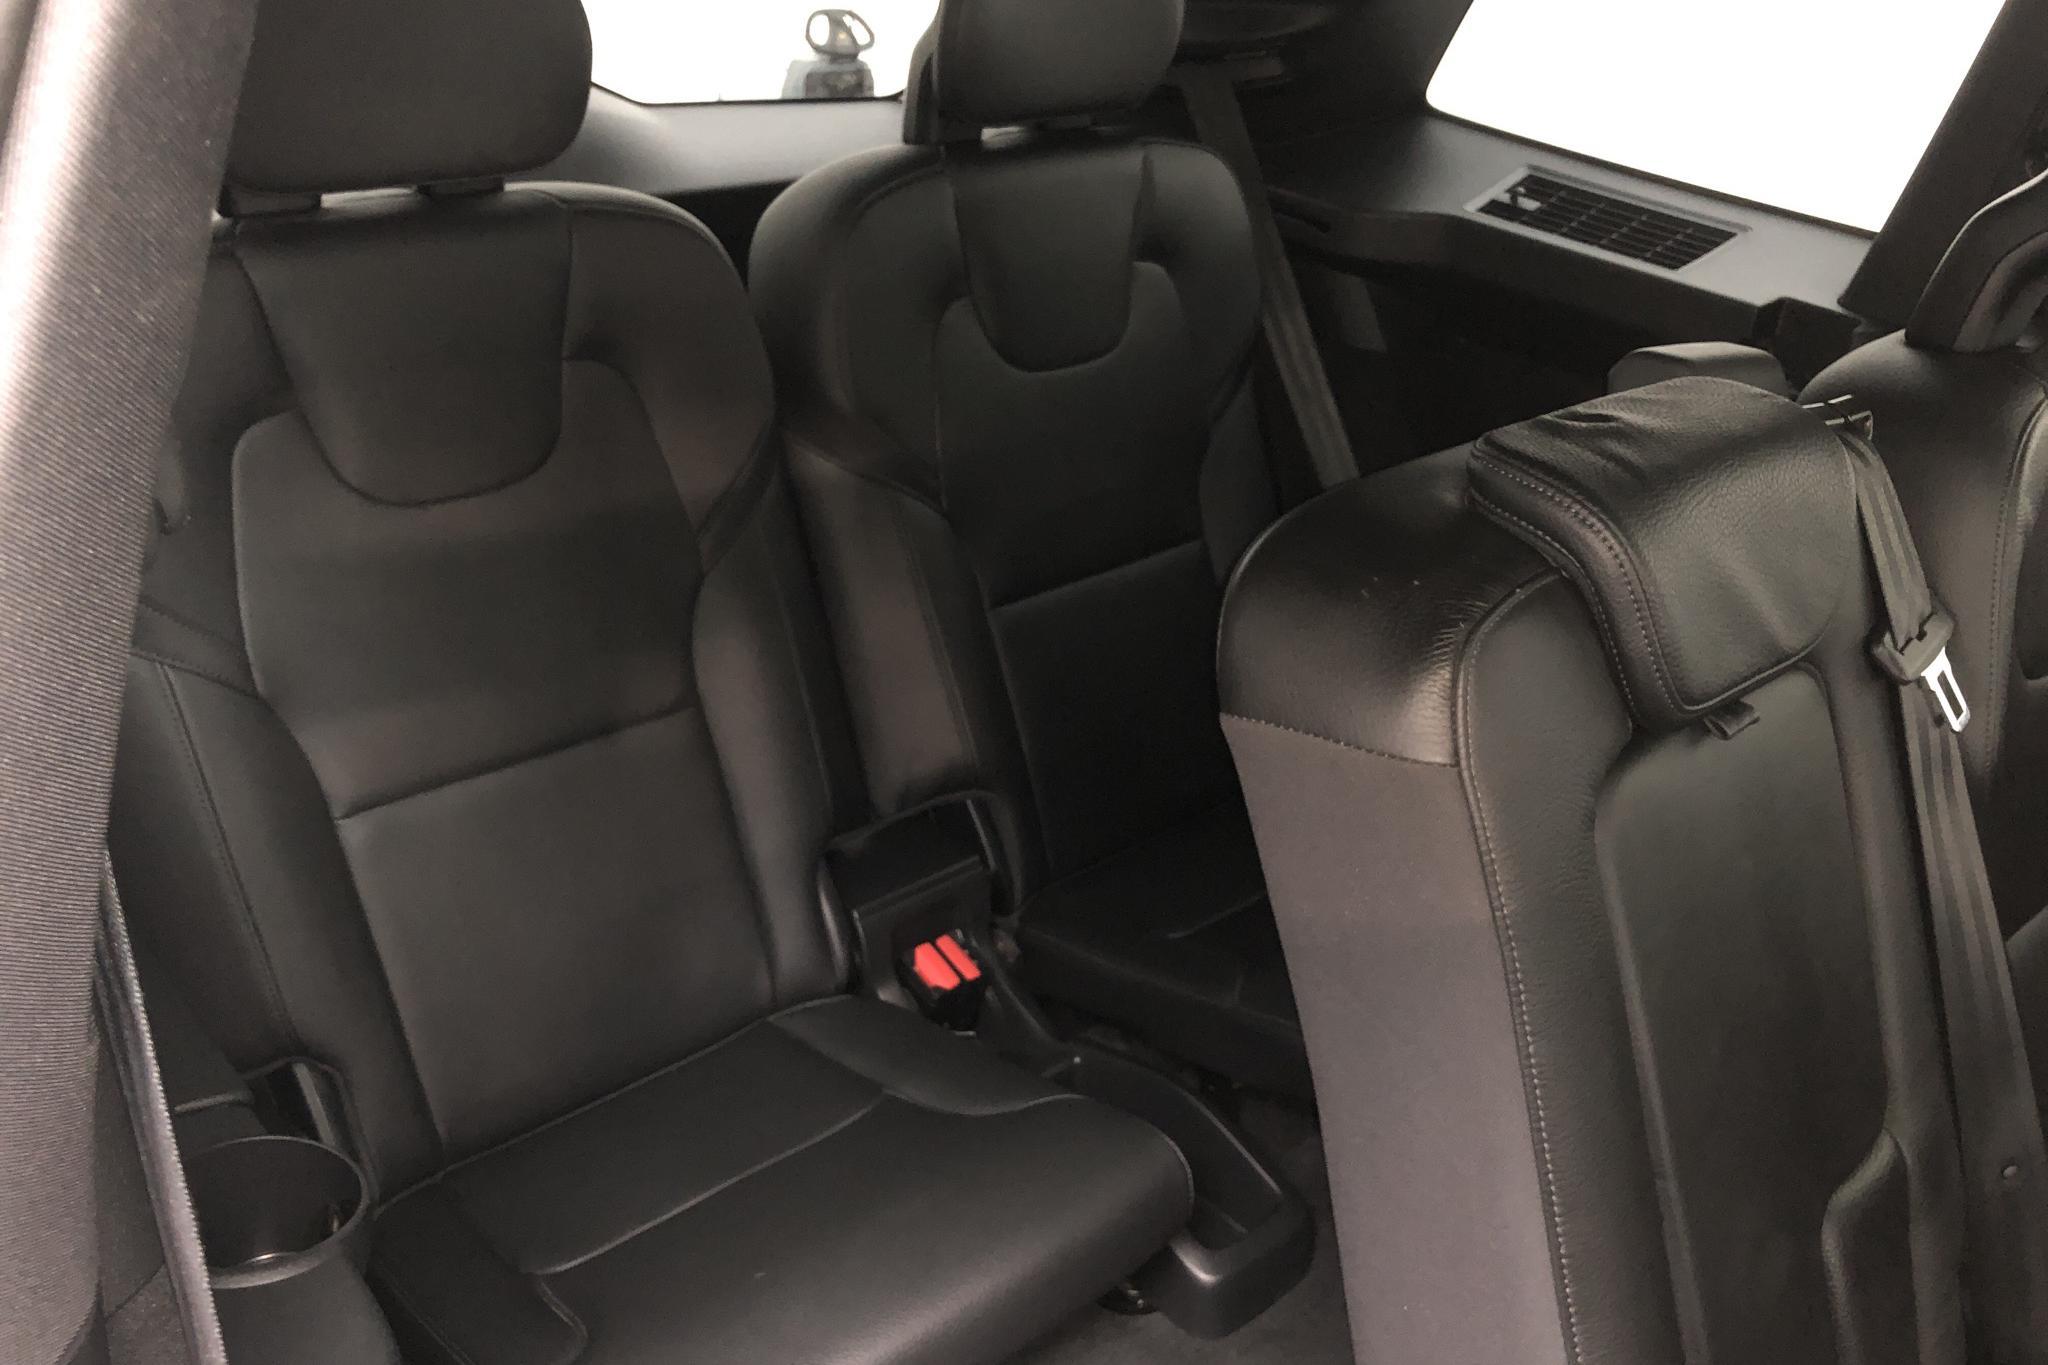 Volvo XC90 D5 AWD (235hk) - 8 128 mil - Automat - svart - 2017